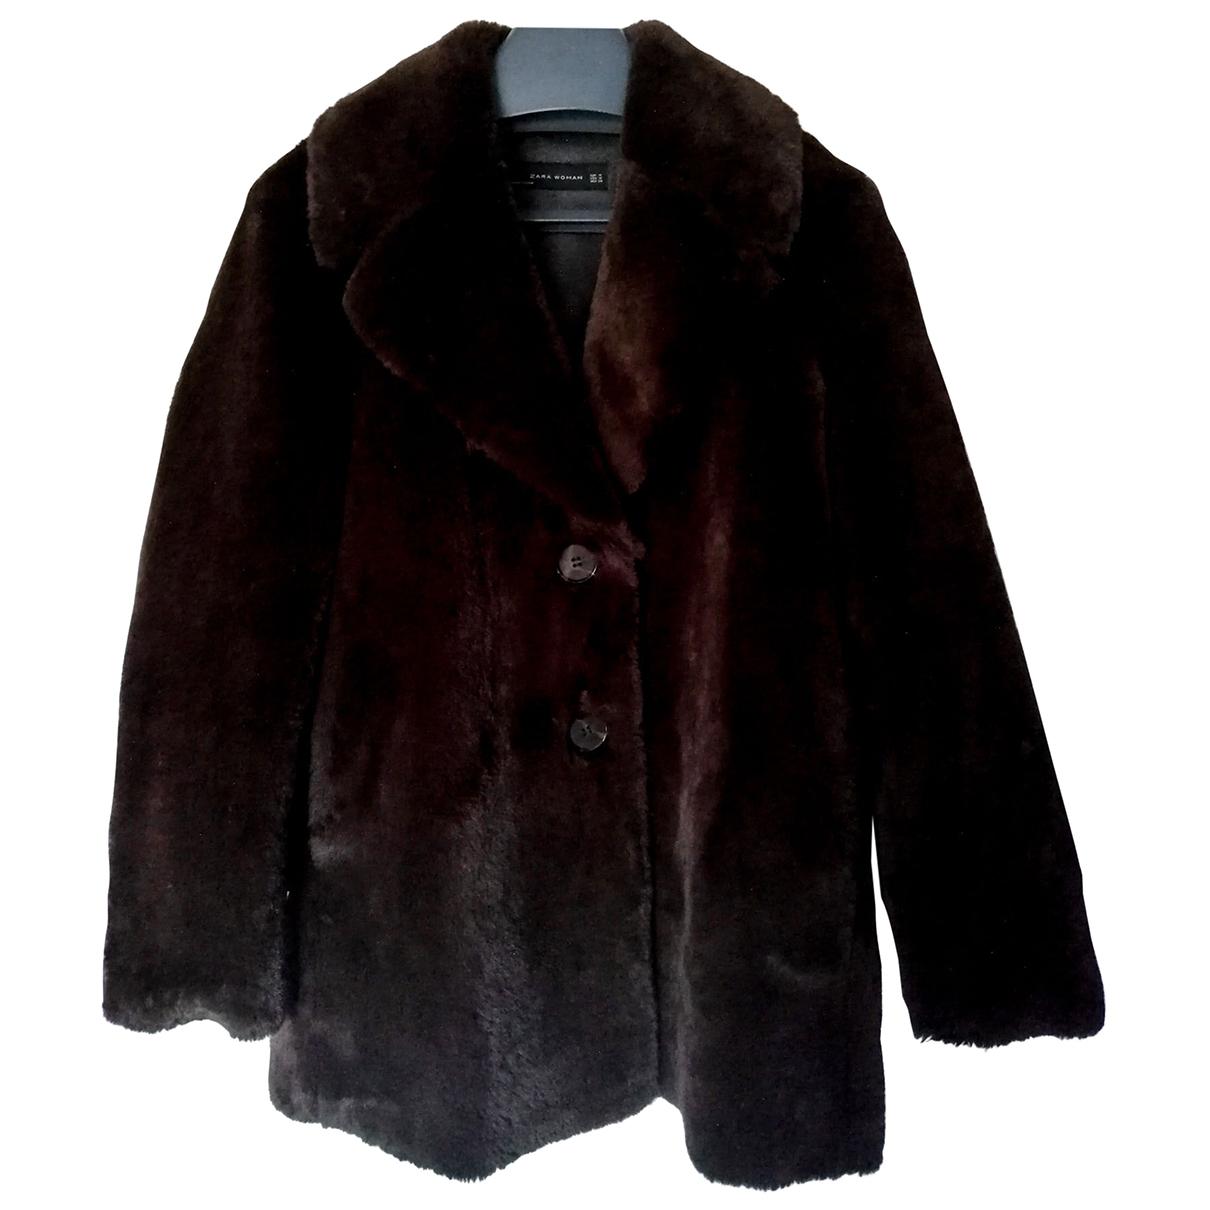 Zara \N Brown Leather coat for Women 36 FR